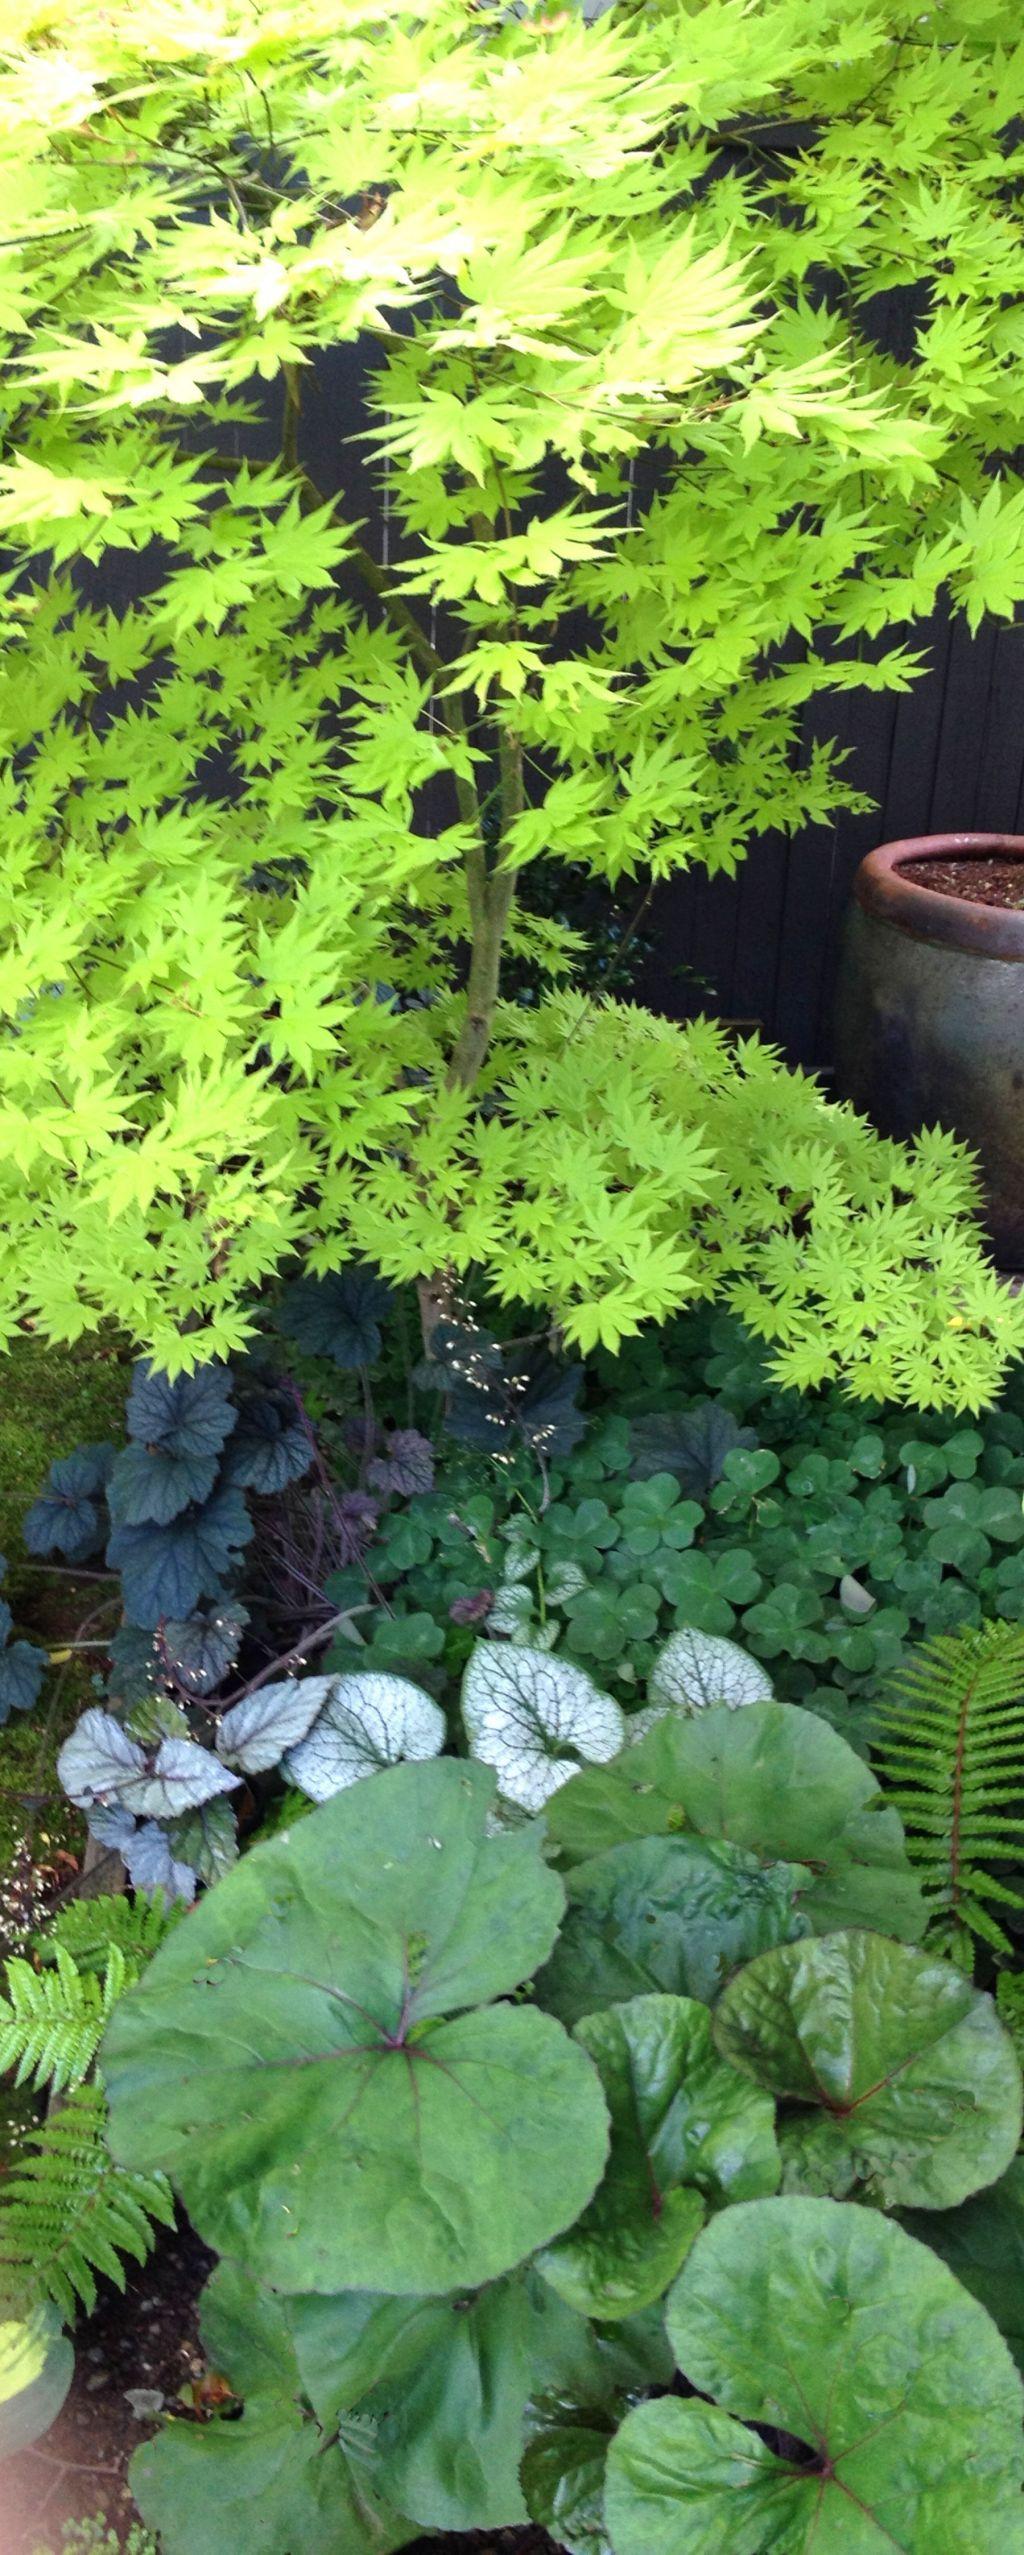 Shady Gardens Design Ideas 210 — Design & Decorating #mosquitoplants